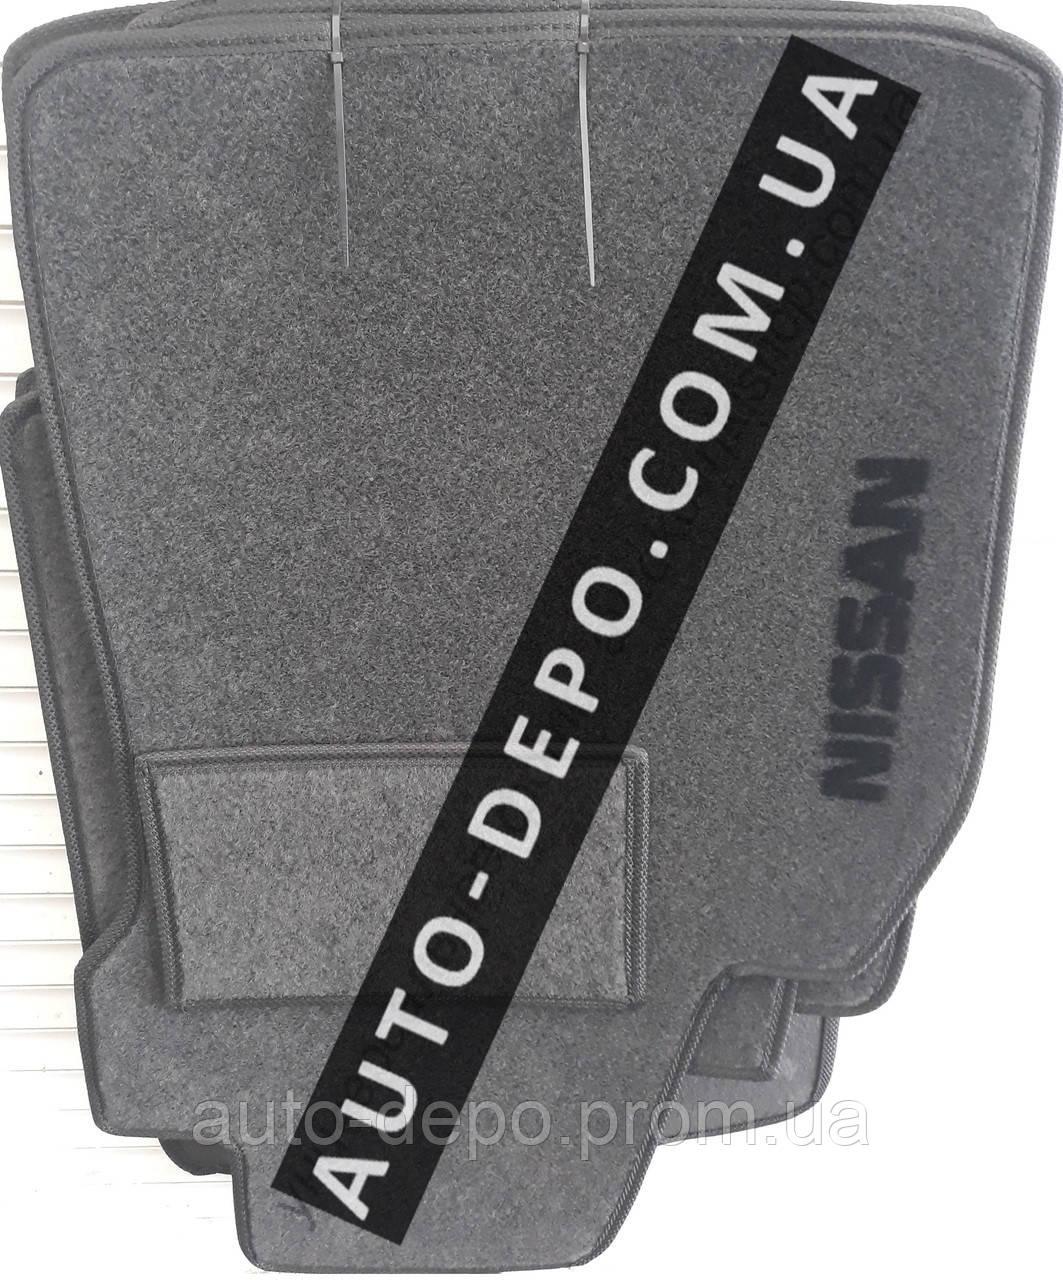 Ворсовые коврики Nissan Juke 2010- VIP ЛЮКС АВТО-ВОРС